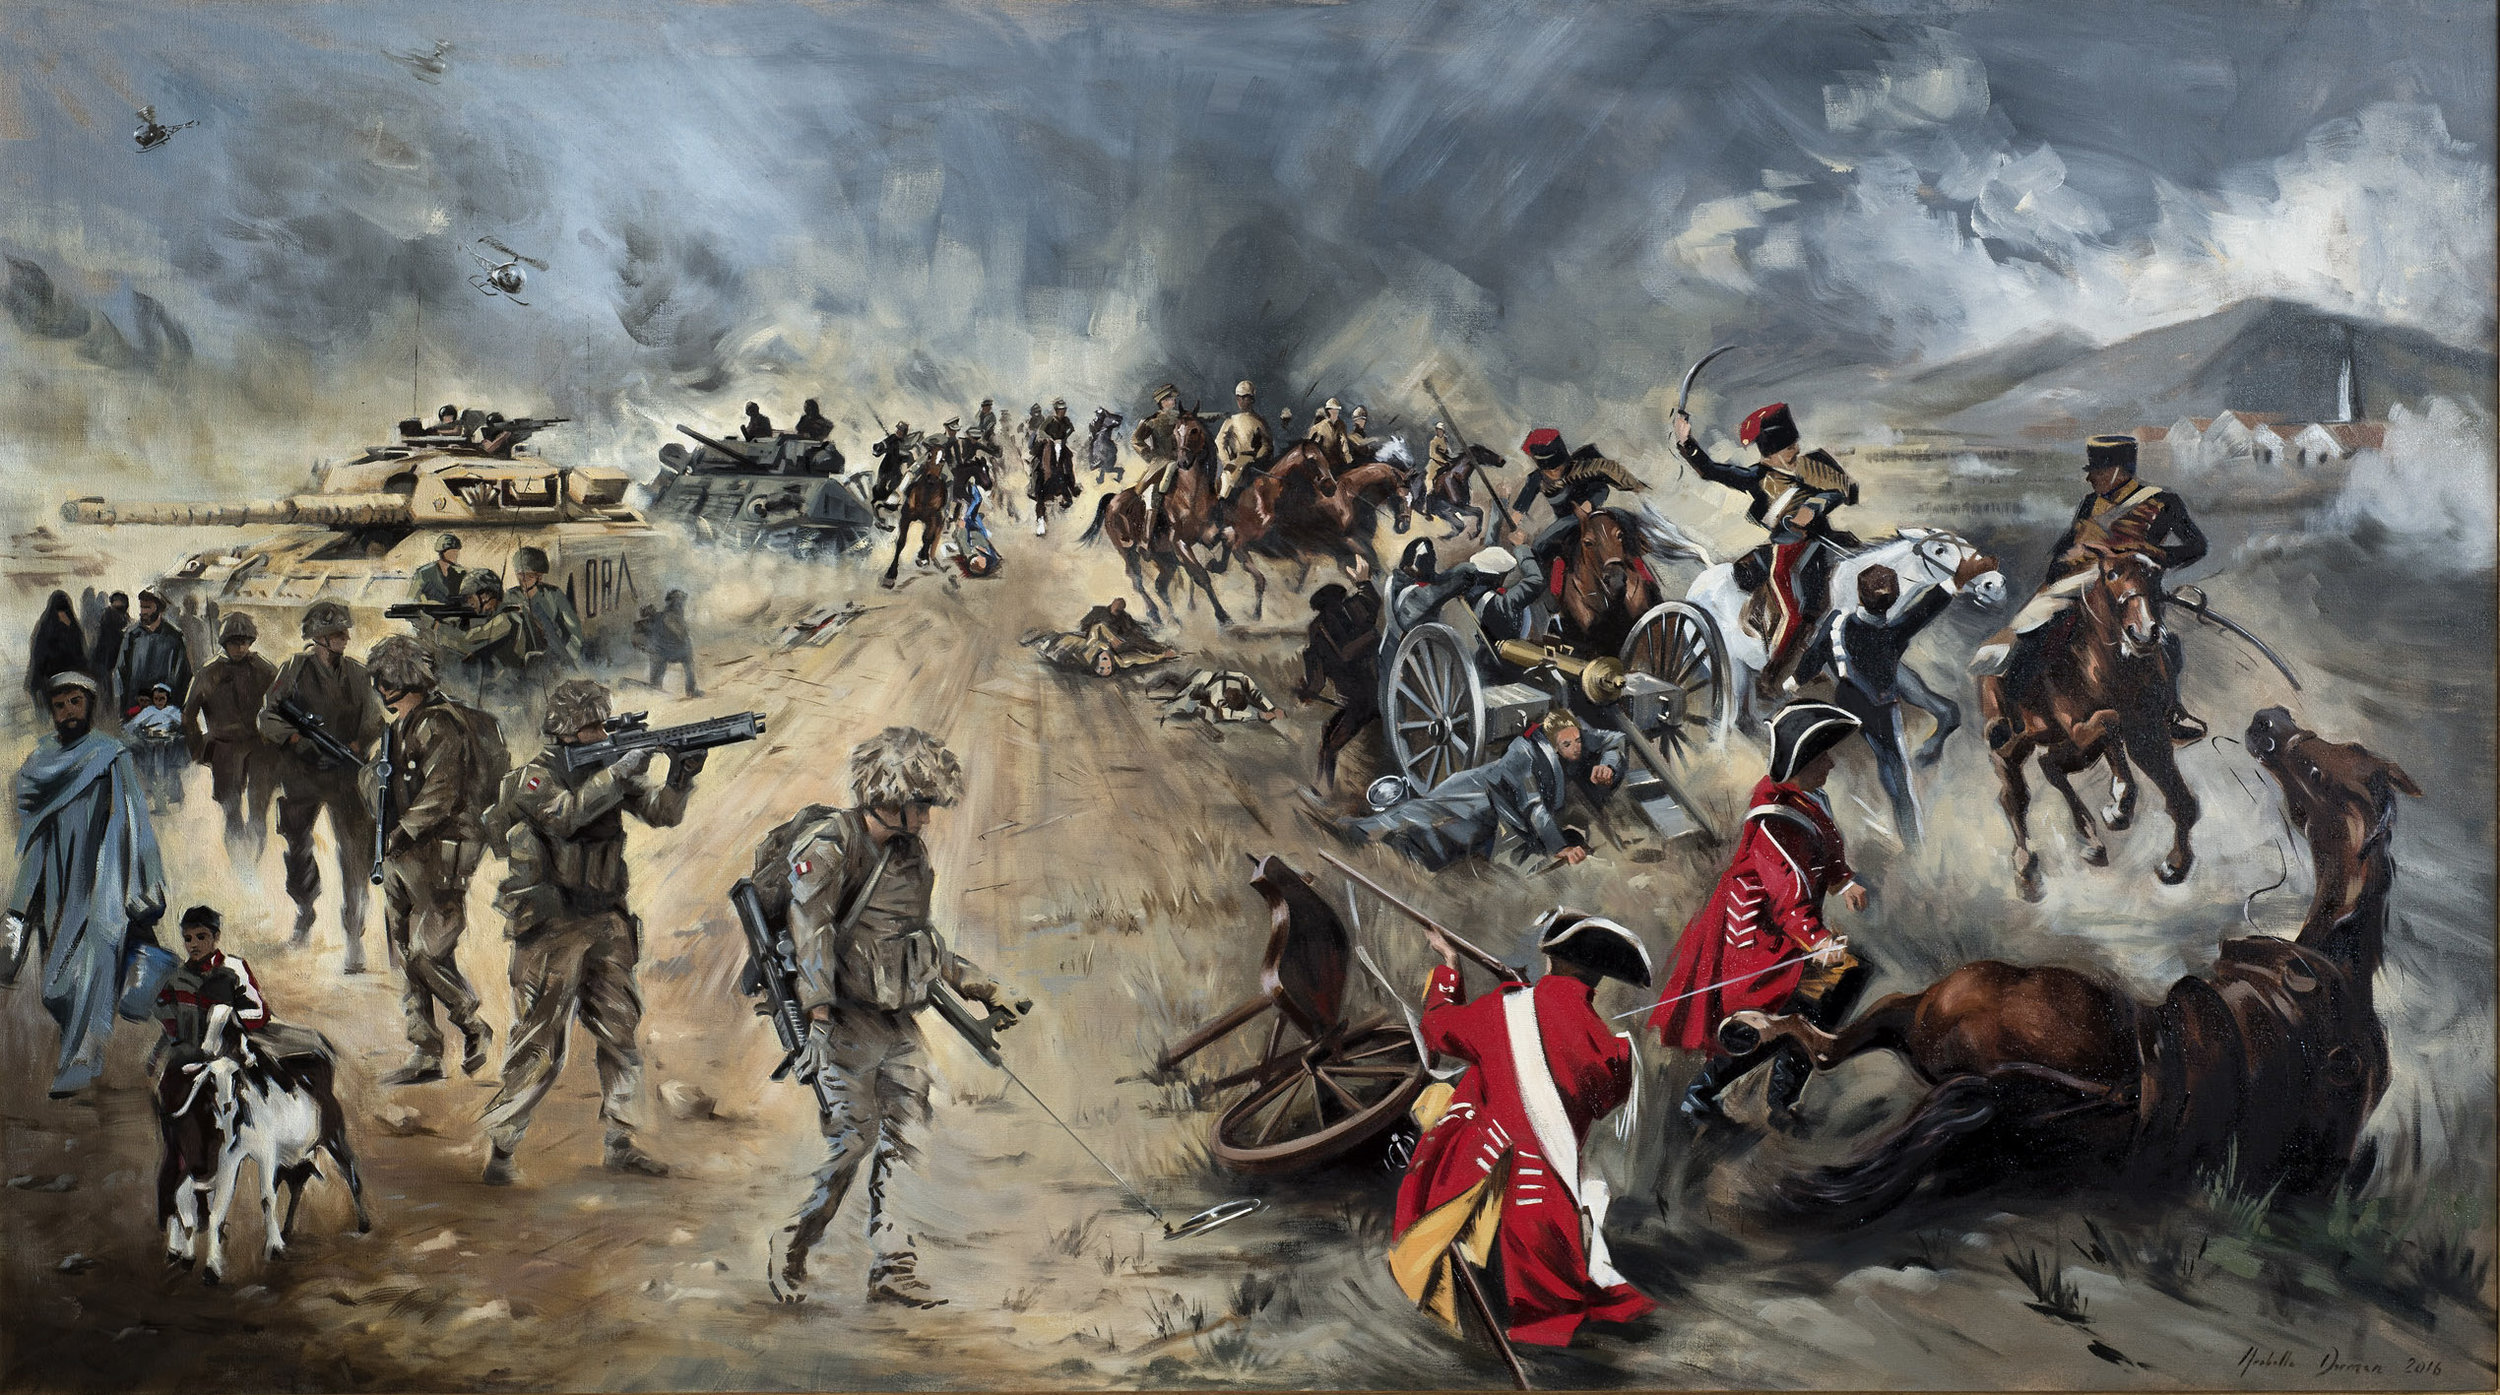 The King's Royal Hussars, 1715 - 2015